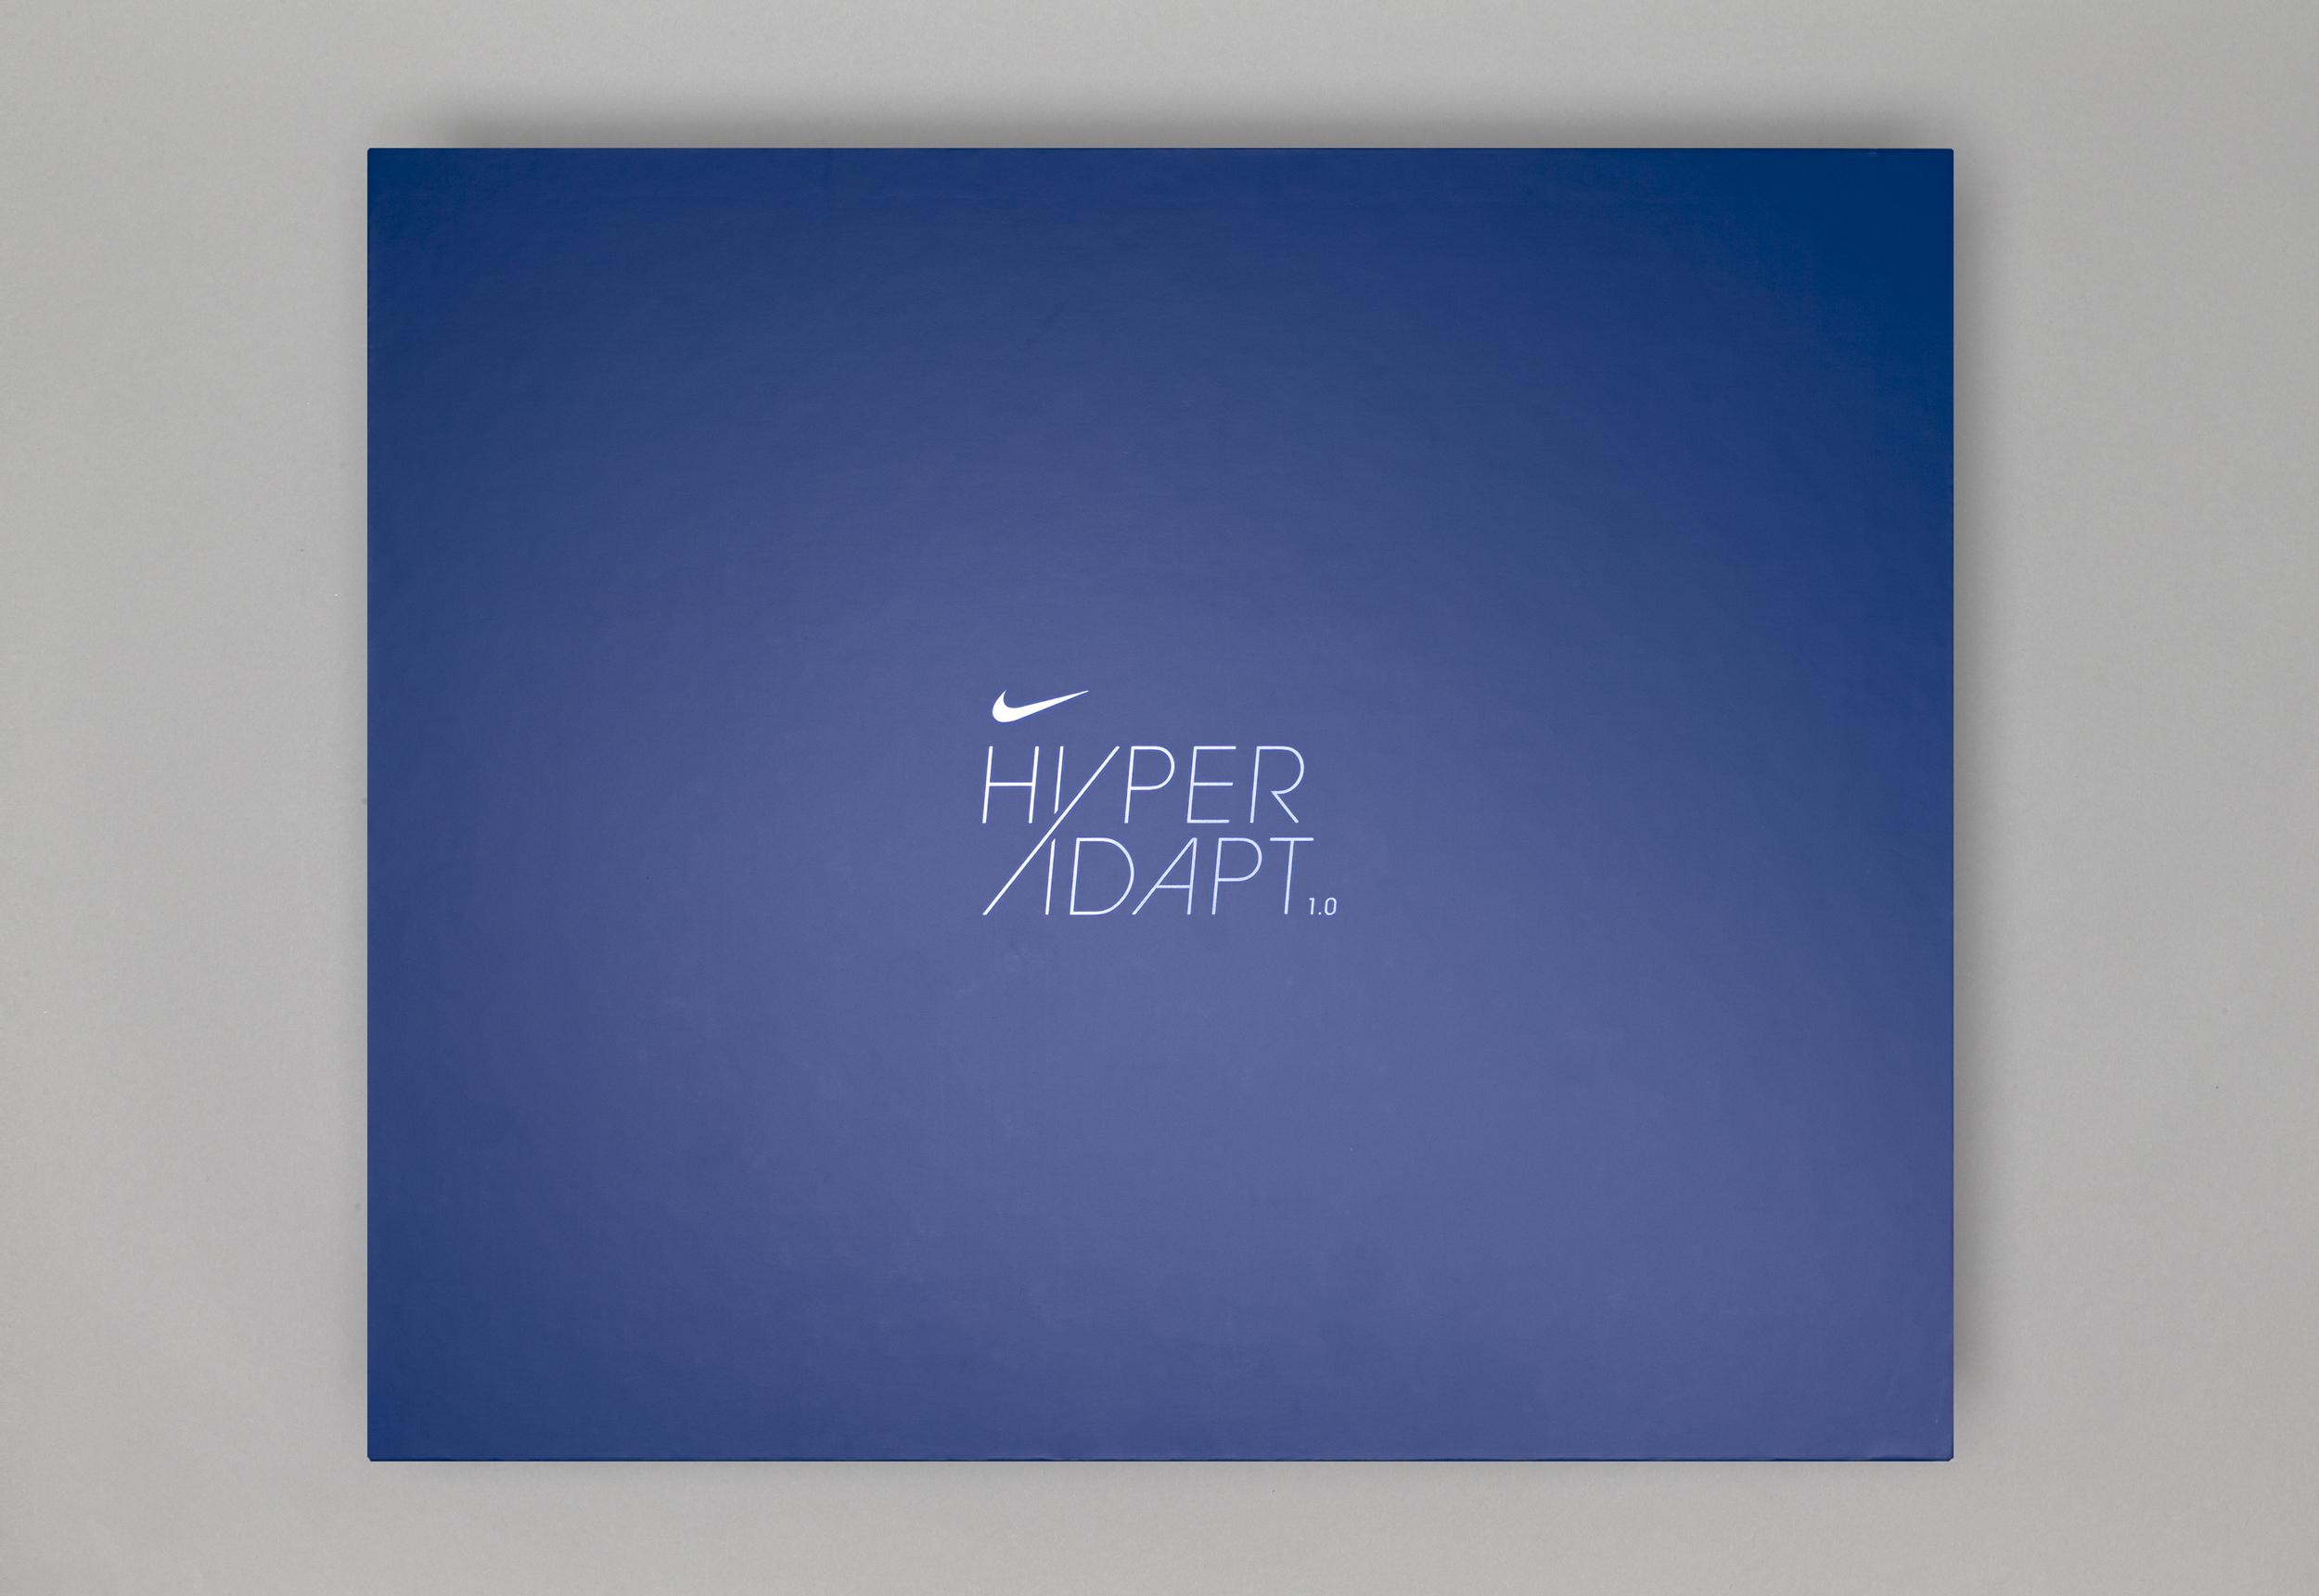 Nike Hyperadapt 1.0 Box